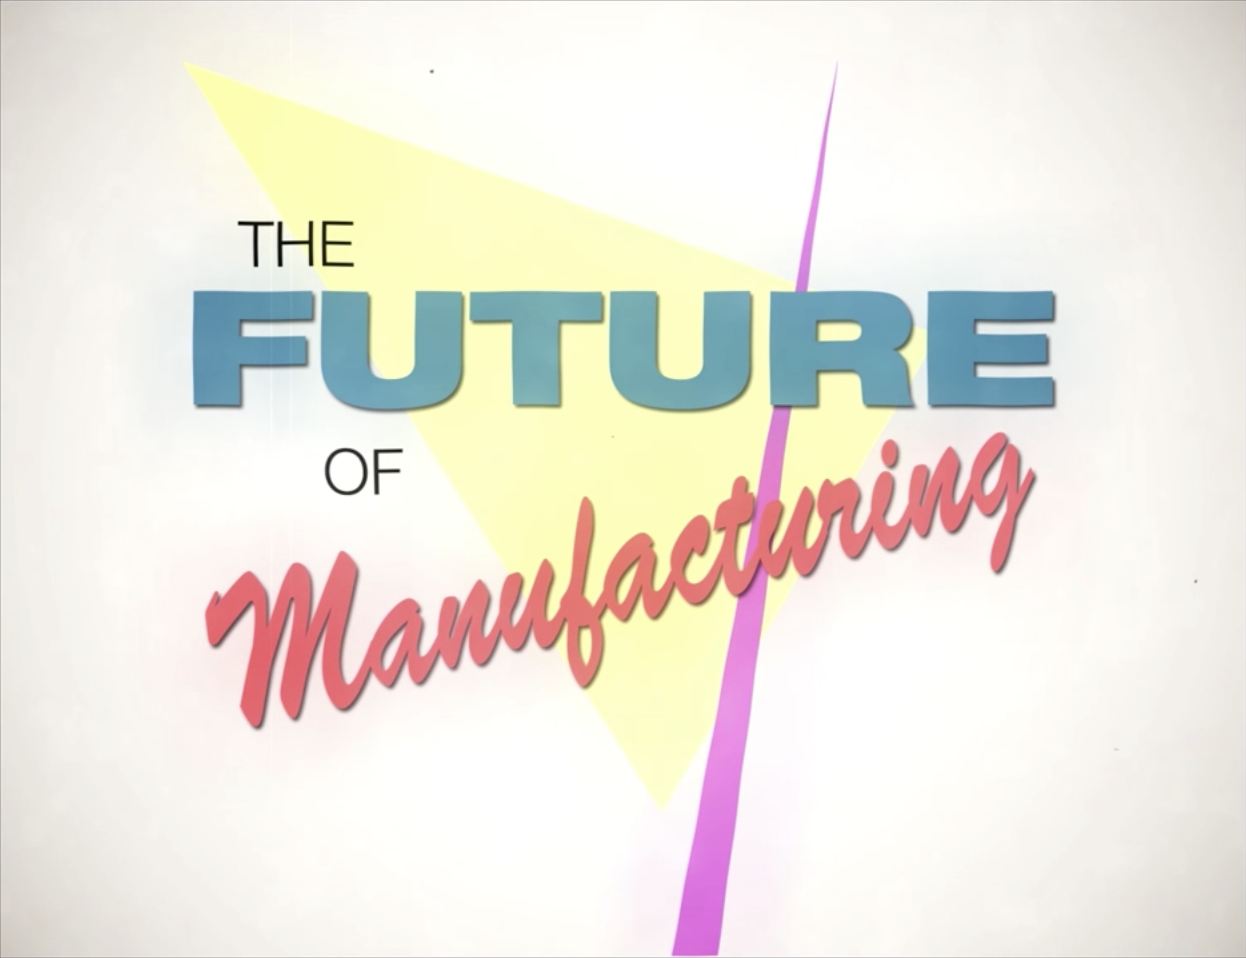 Modern Manufacturers Connect Through Cloud ERP